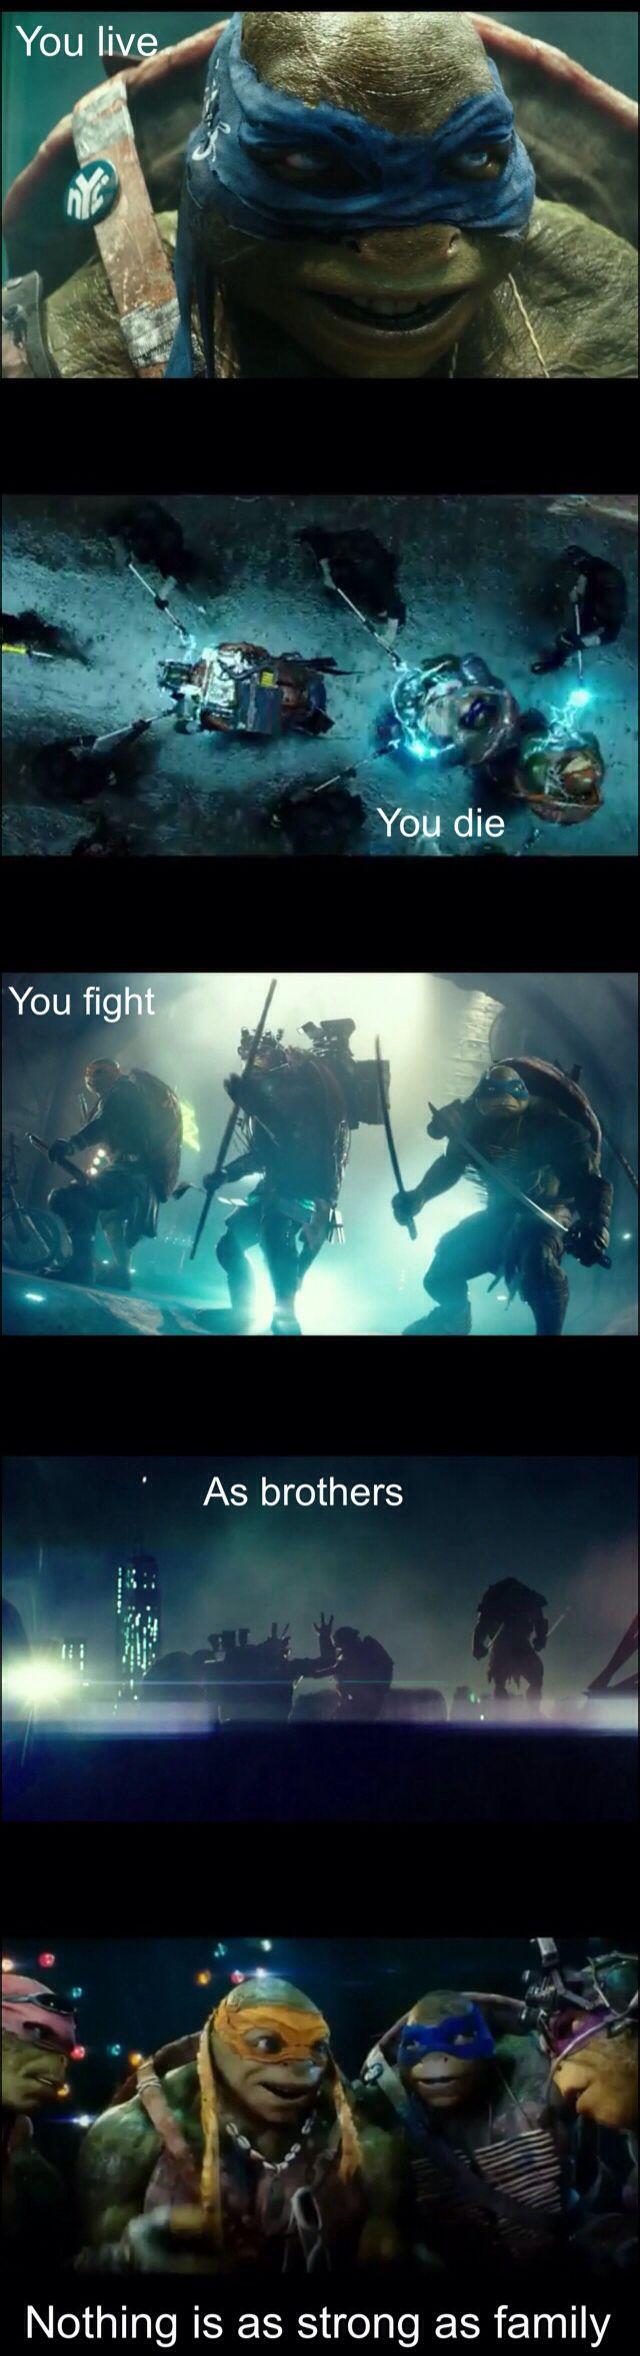 Worst ninja turtle movie EVER! However I'll always love my boys. Michael Bay can go *#%* himself.